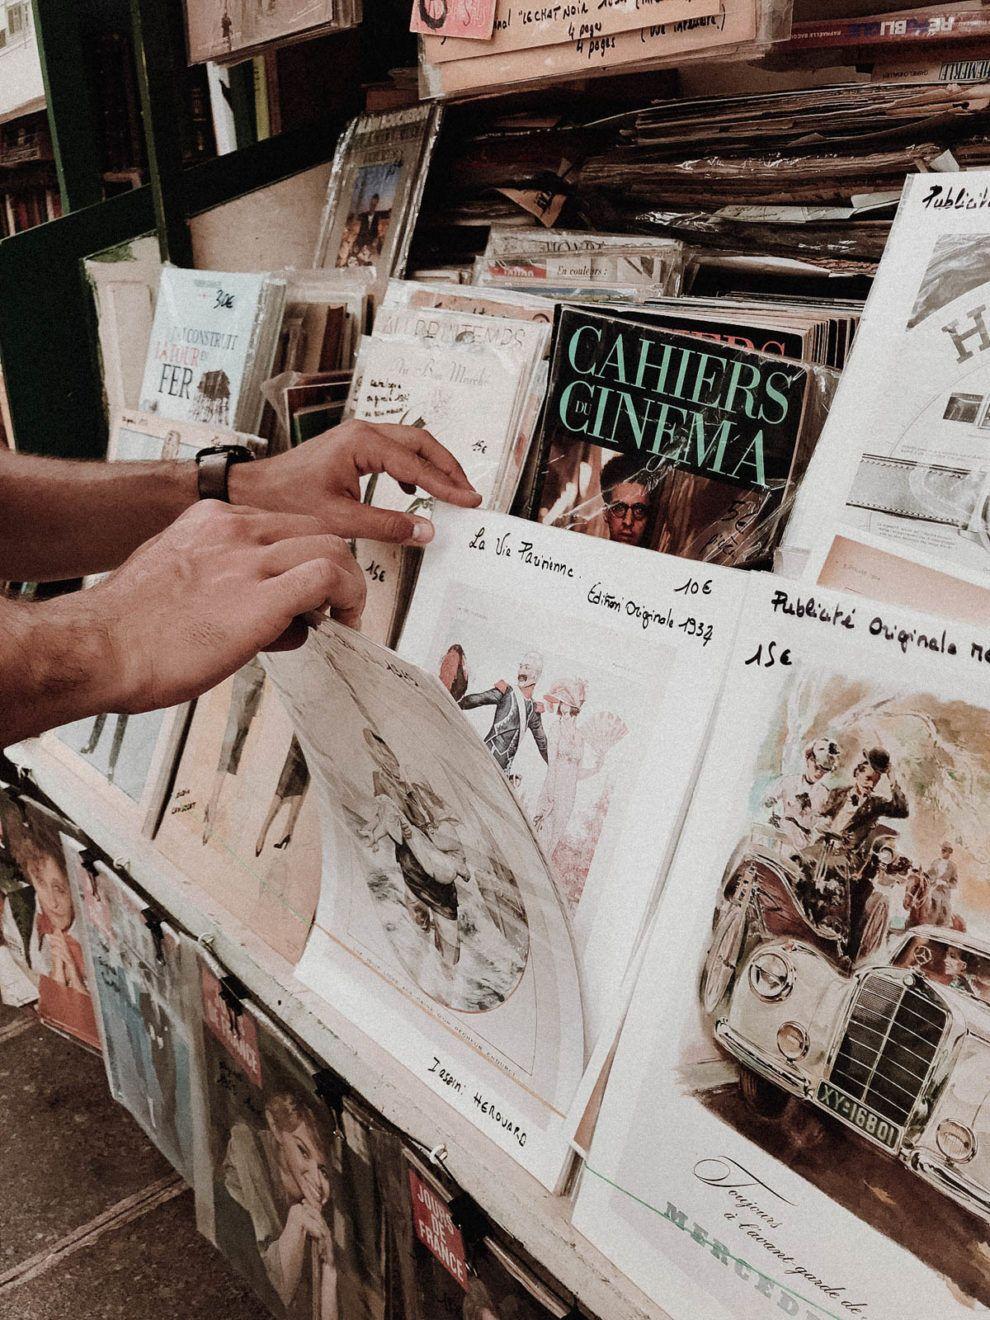 Paris France Travel Guide - Shopping, Vintage Prints / RG Daily Blog